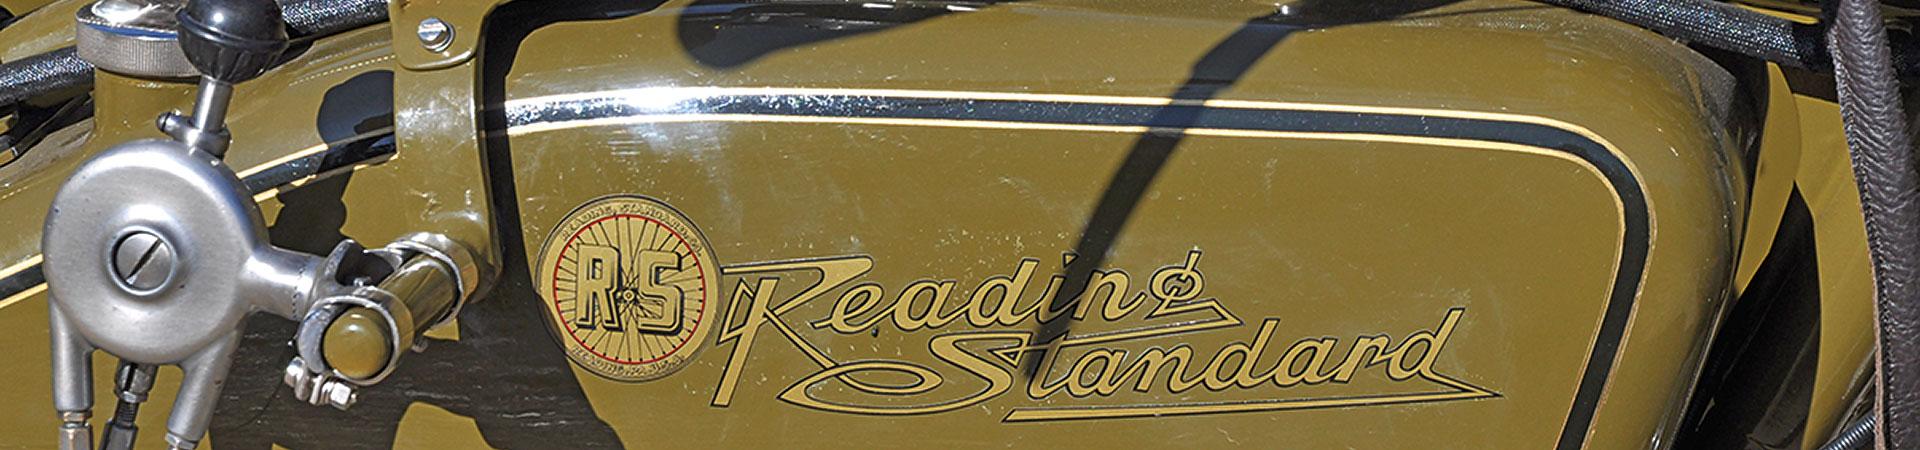 Borgo-Reading-Standard